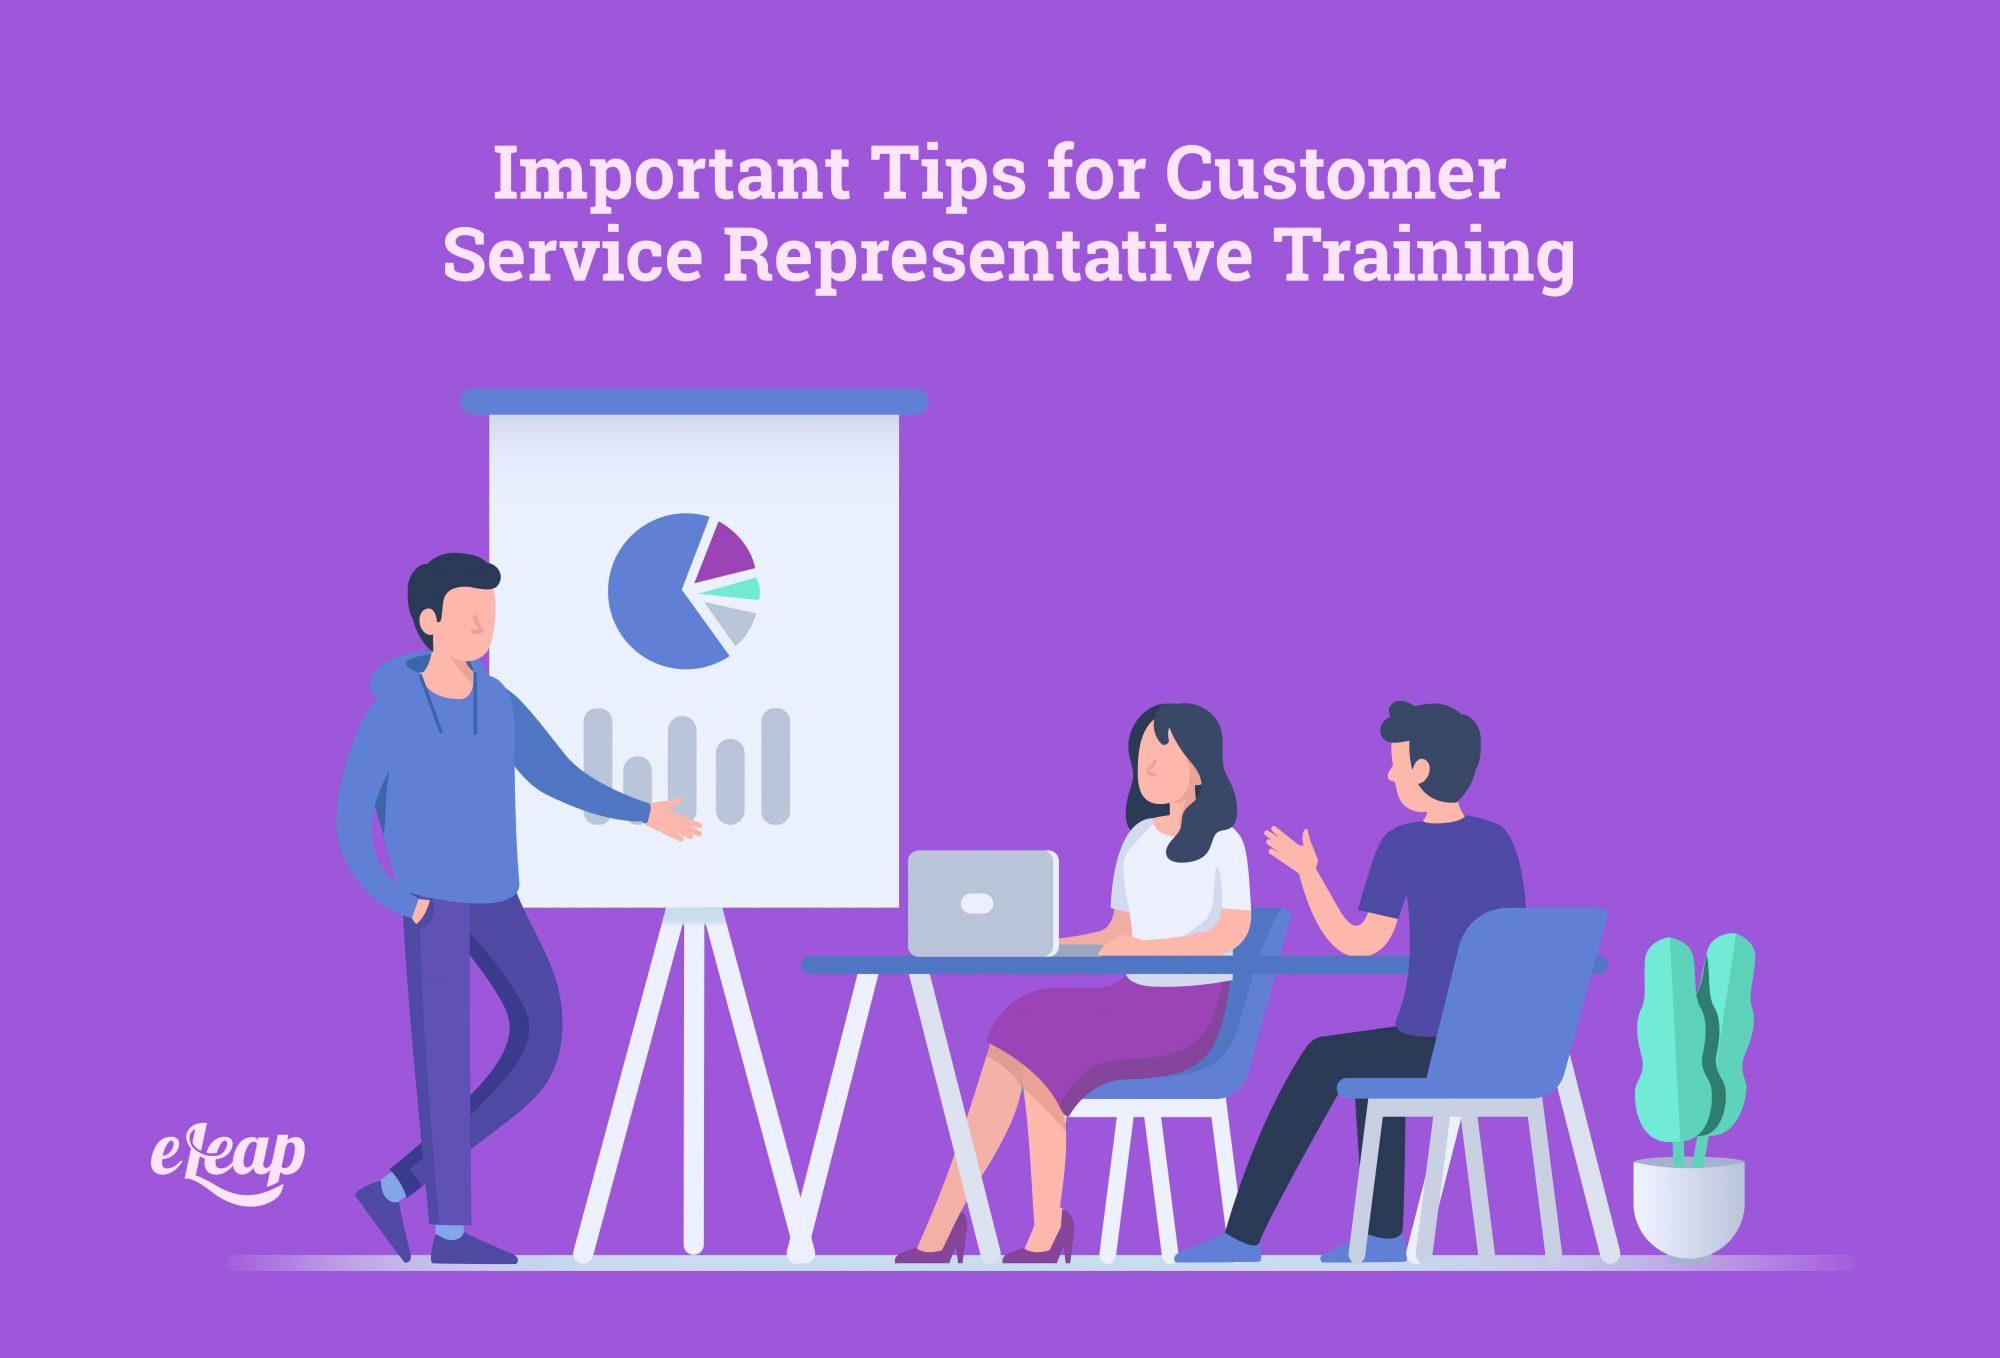 Important Tips for Customer Service Representative Training